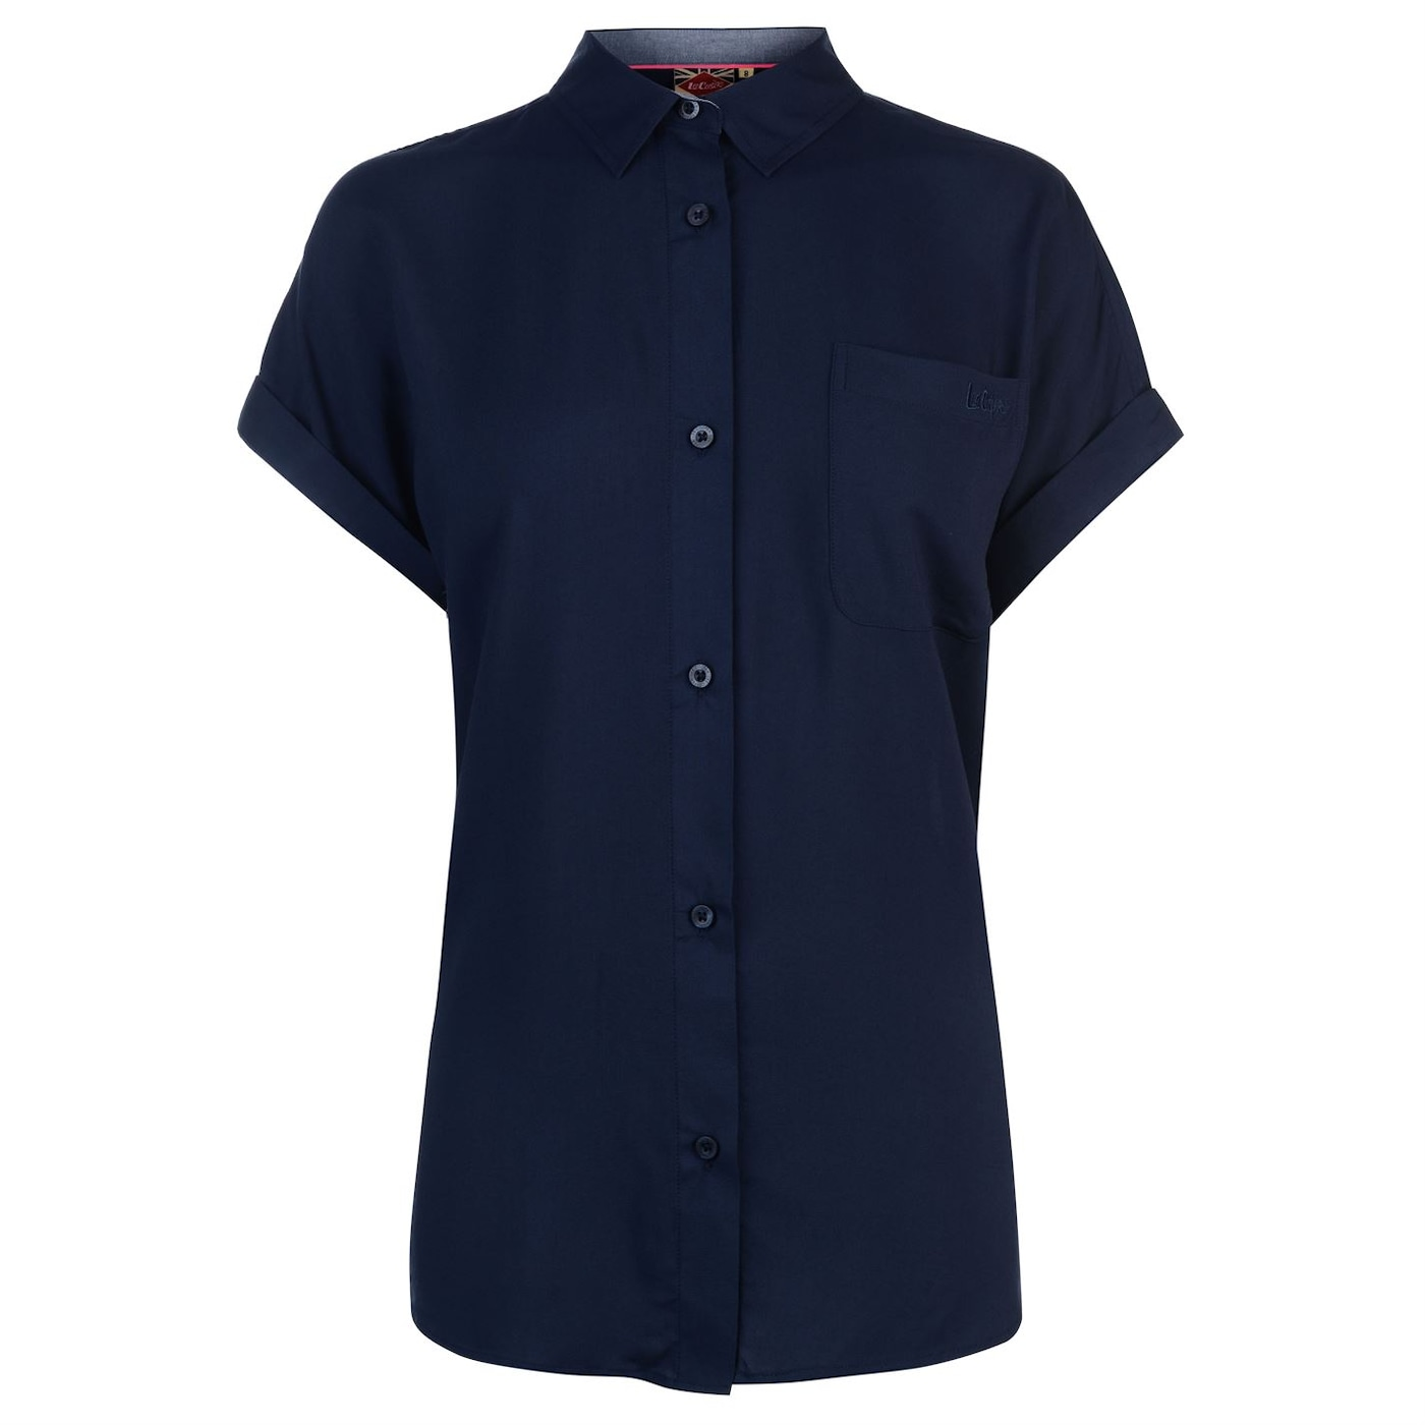 Lee Cooper Short Sleeve Shirt dámské